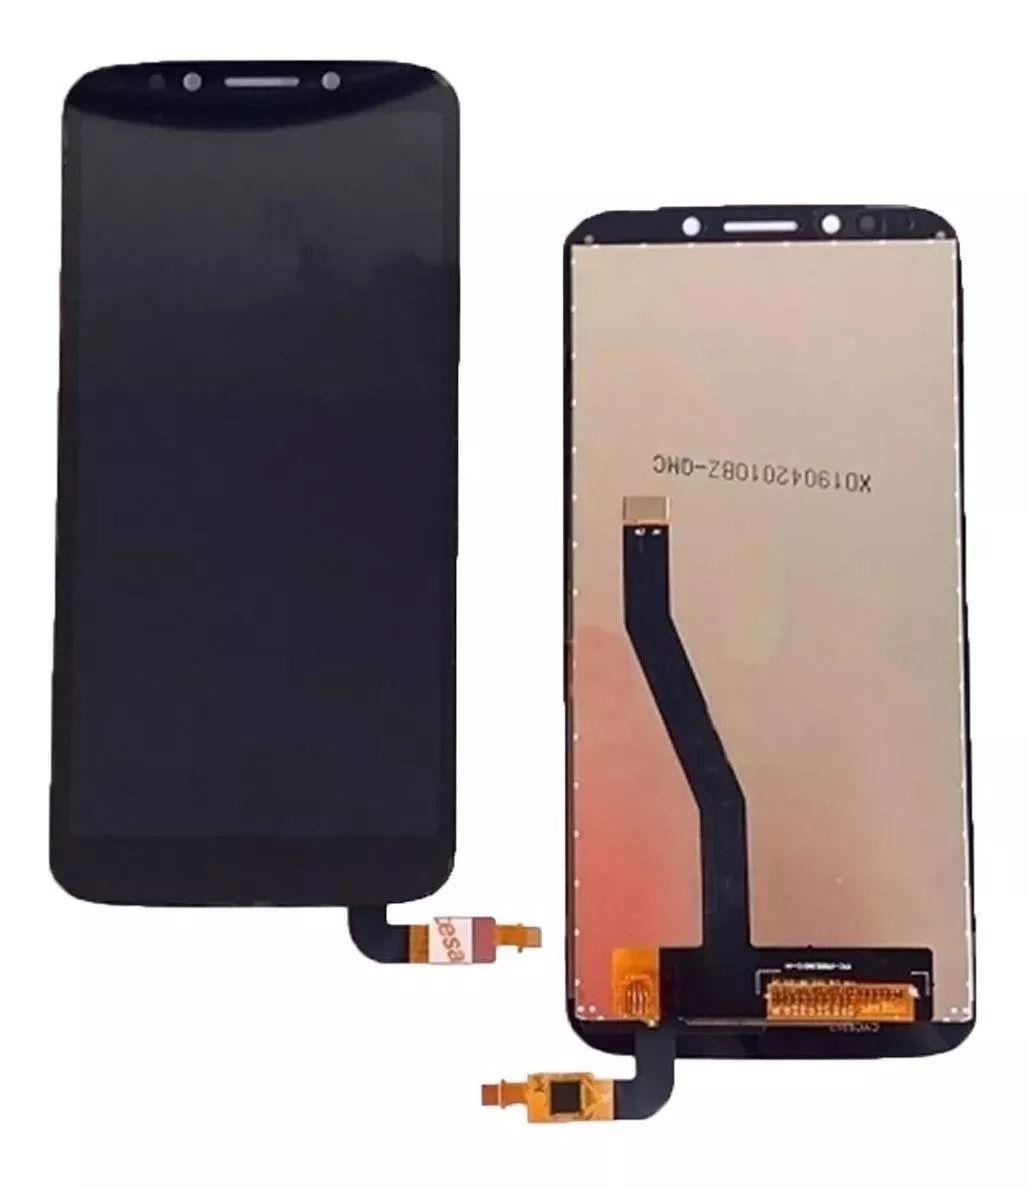 Display Frontal Motorola Xt1920  Moto E5 Play / MotoE5 Play Preto Sem aro